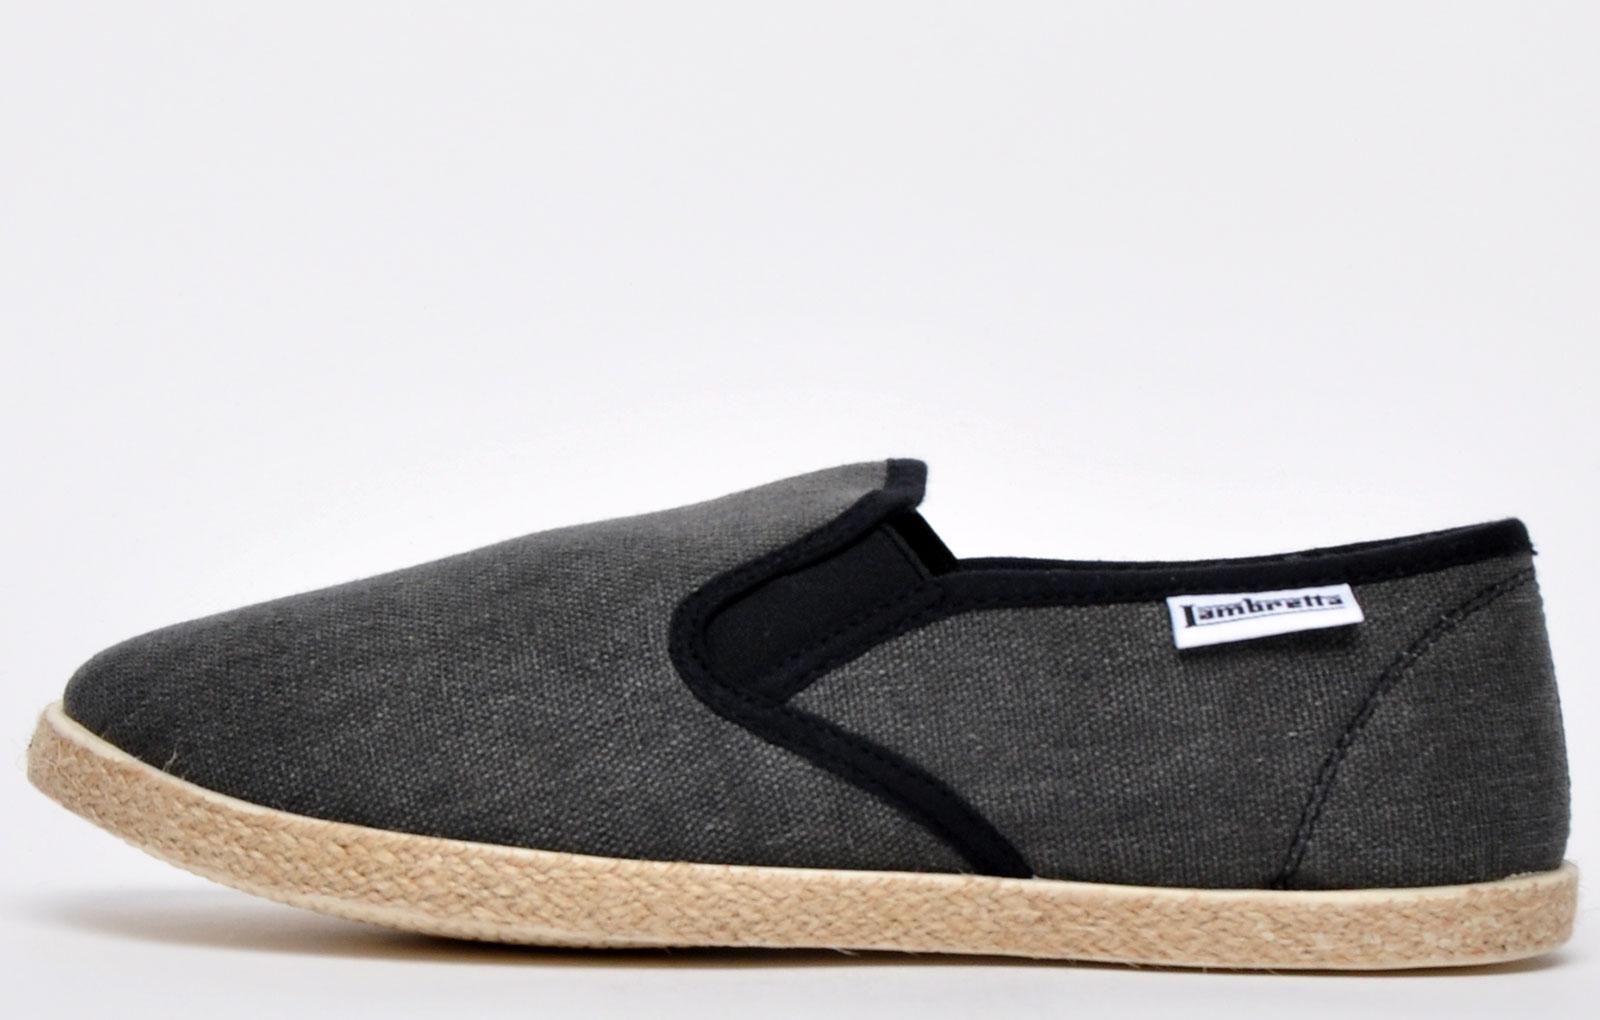 Mens Lambretta Shoes   Cheap Lambretta